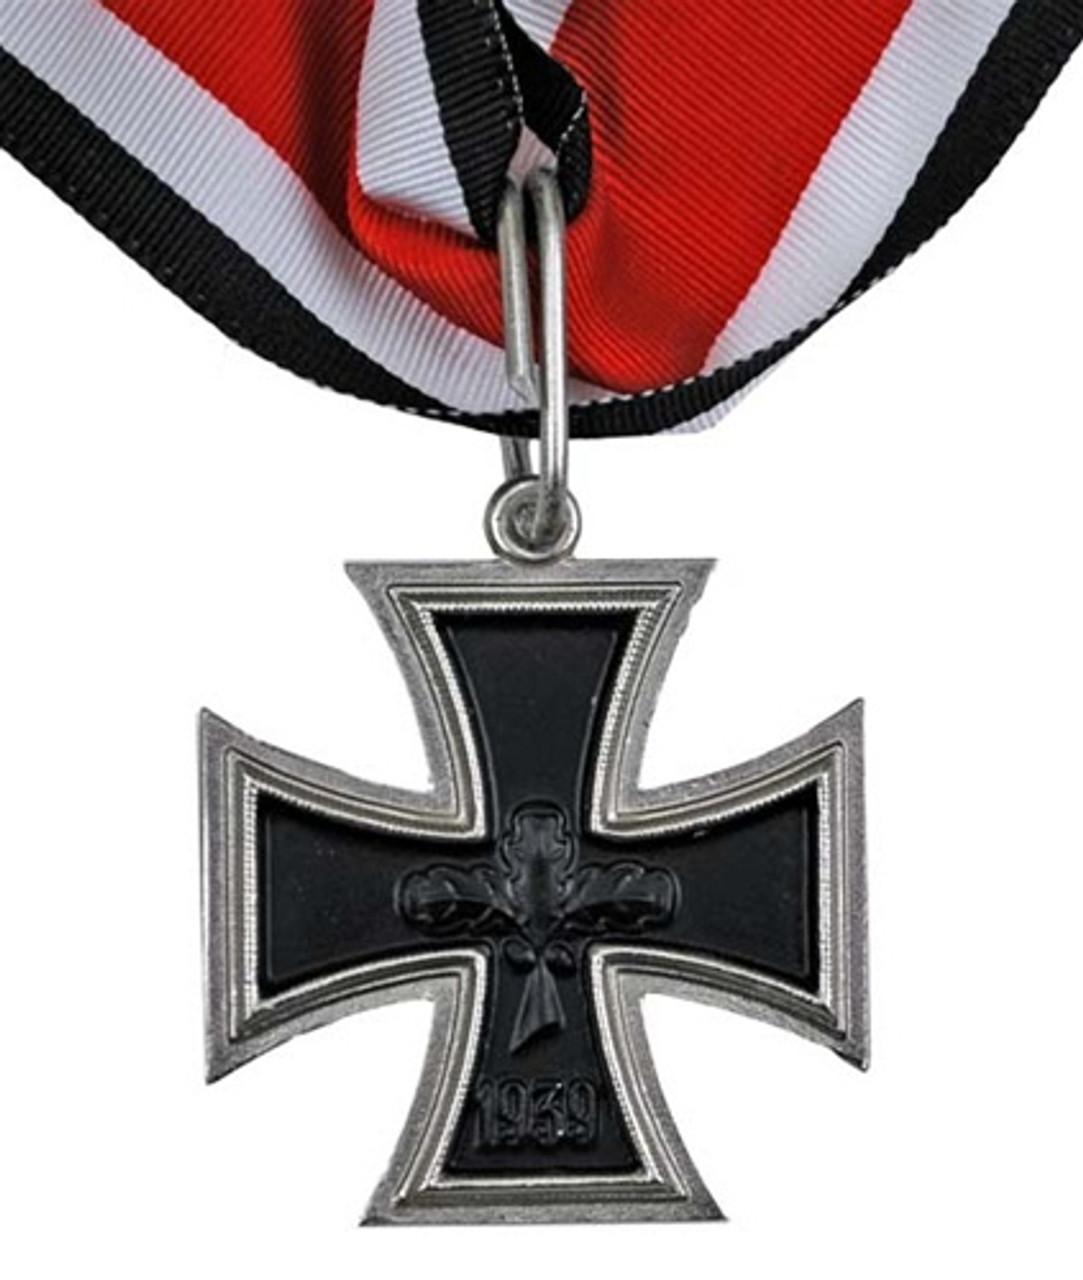 1957 Honorary Knight's Cross (Ritterkreuz)  from Hessen Antique